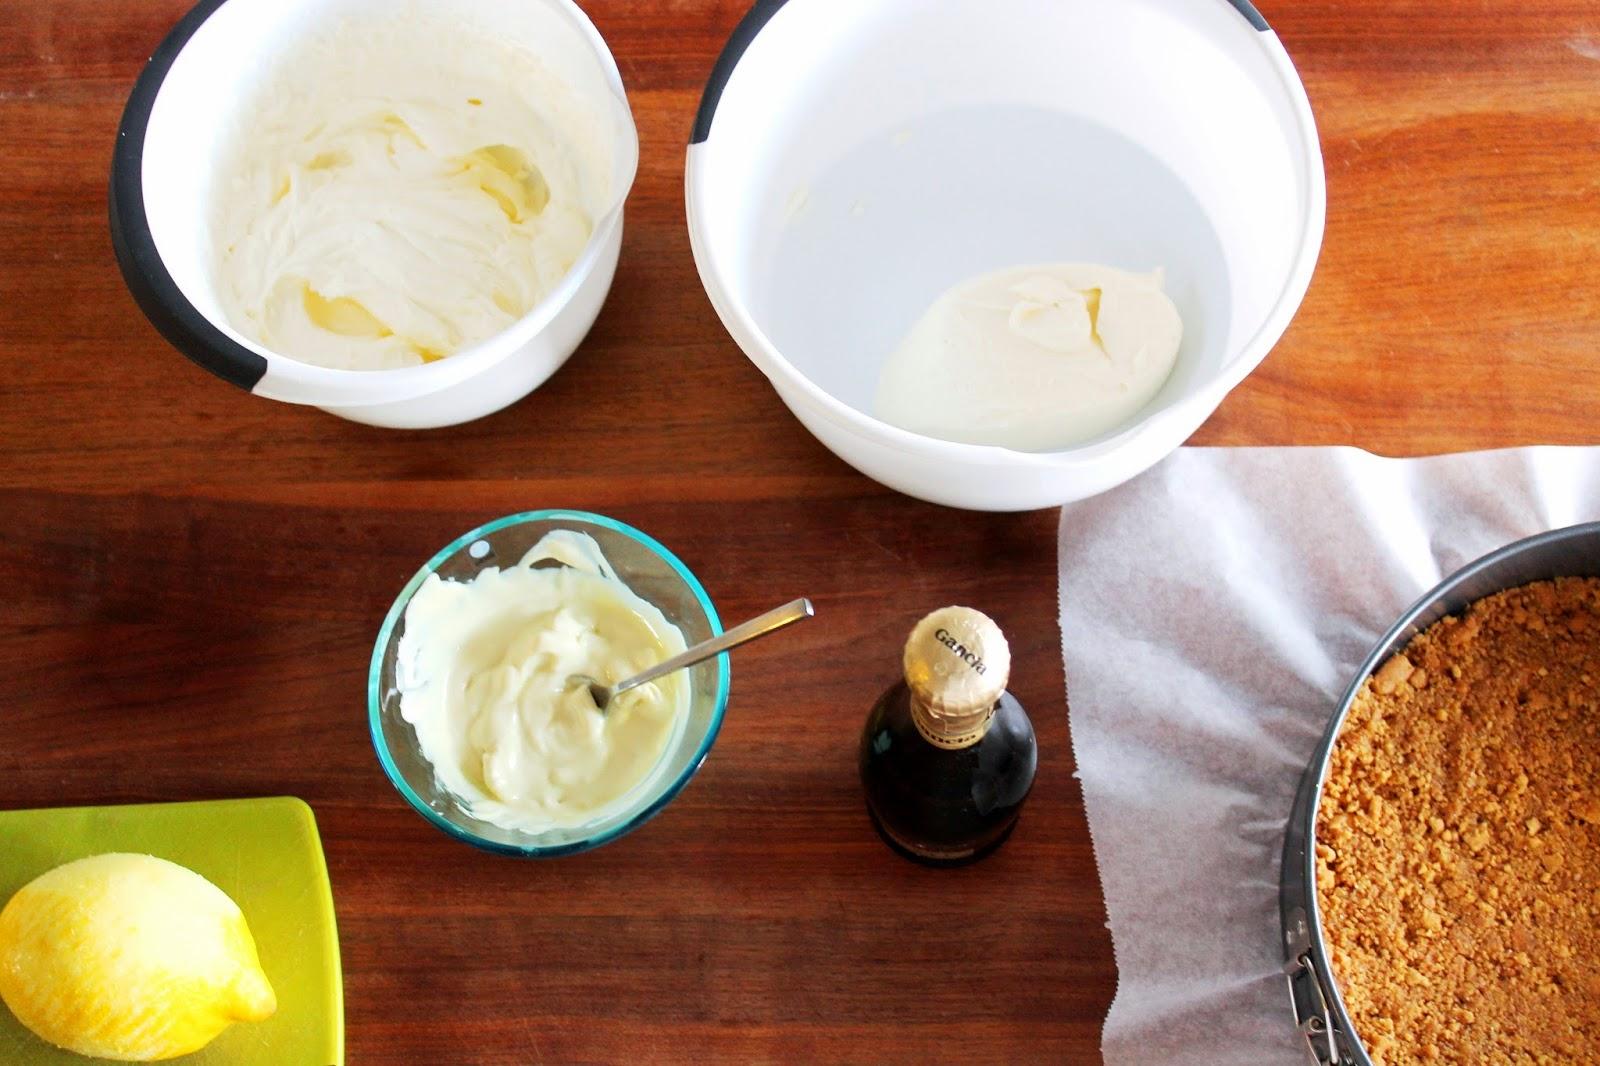 Baking whitechocolate-champagne-cheesecake   Alinan kotona blog #recipe #cheesecake #champagne #lemon #baking